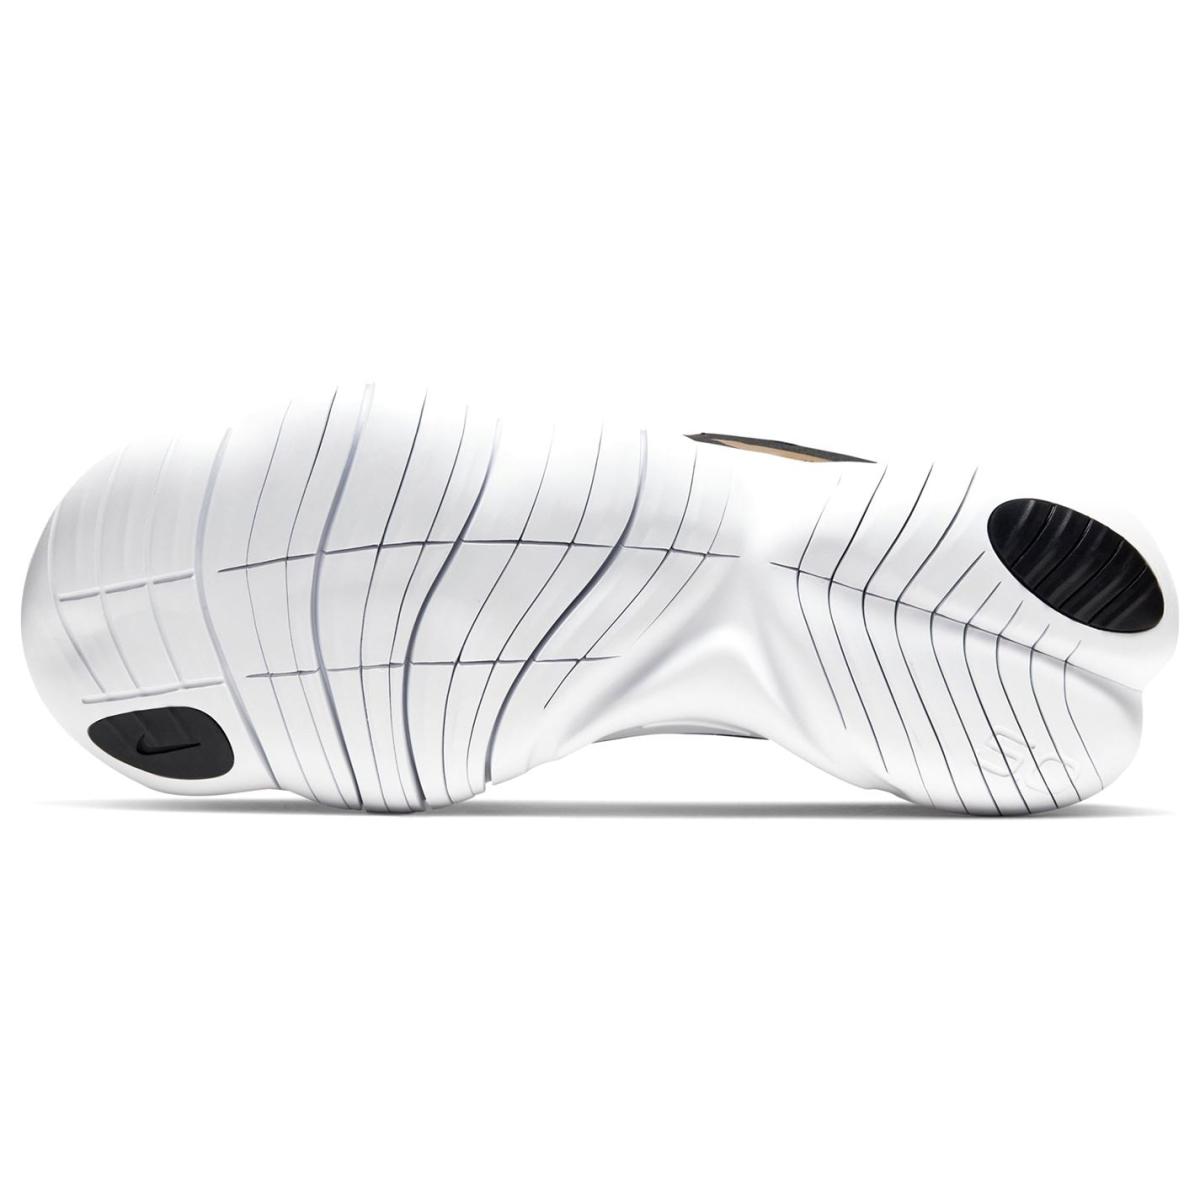 Nike-Free-Run-5-0-Turnschuhe-Damen-Sneaker-Sportschuhe-Laufschuhe-4923 Indexbild 5